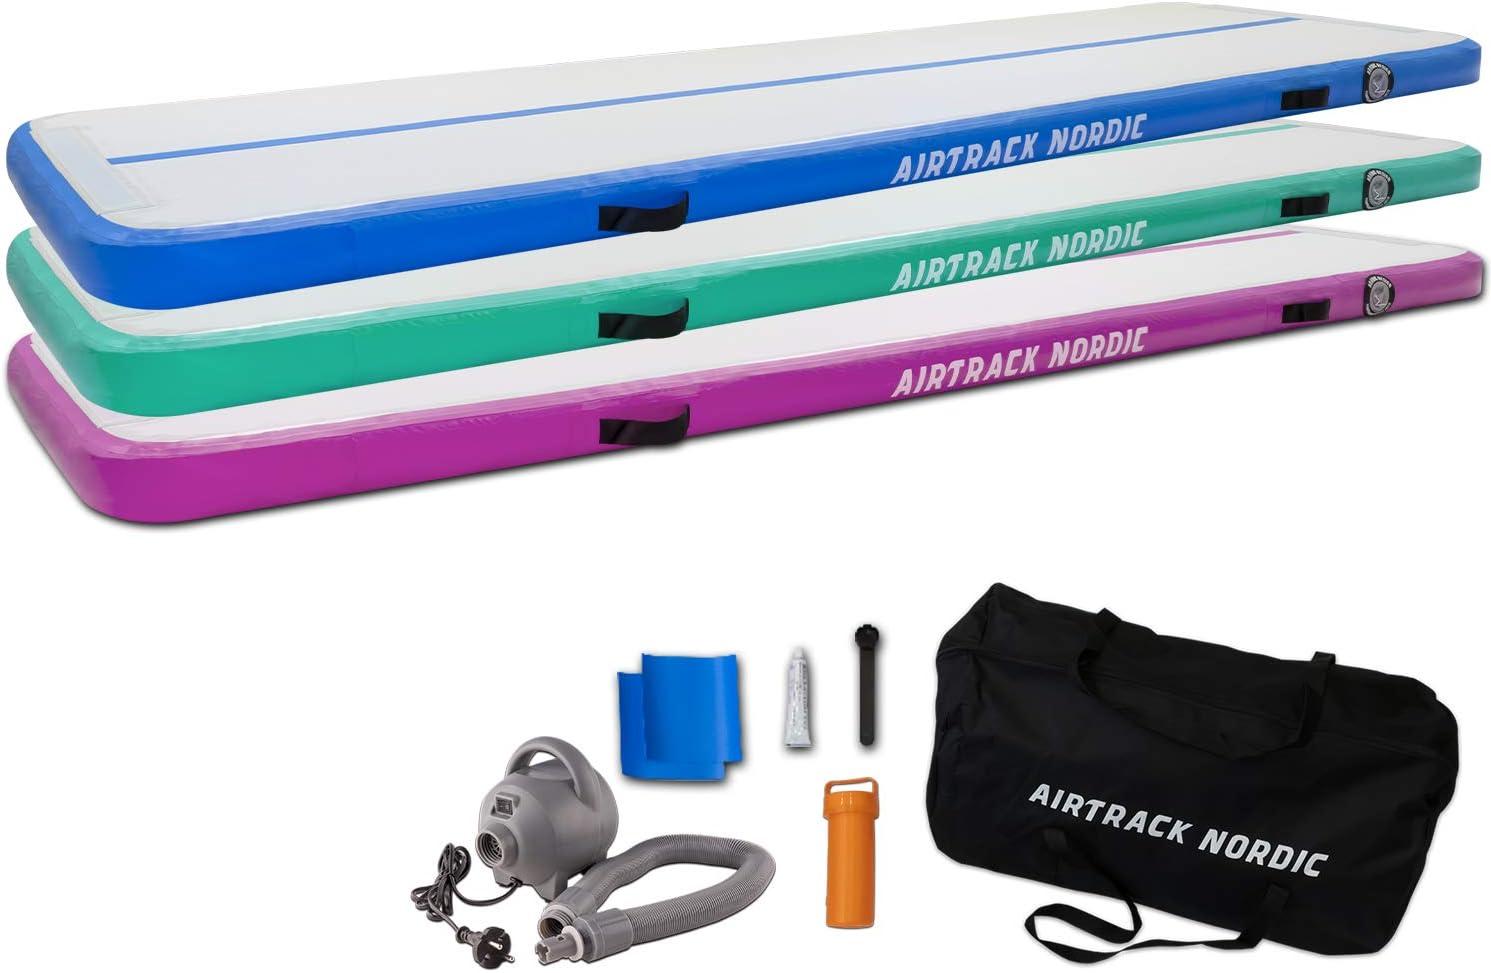 Air Track Ginnastica Gonfiabile Tumbling Mat Spessore Airtrack Mats con pompa di aria elettrica per la casa